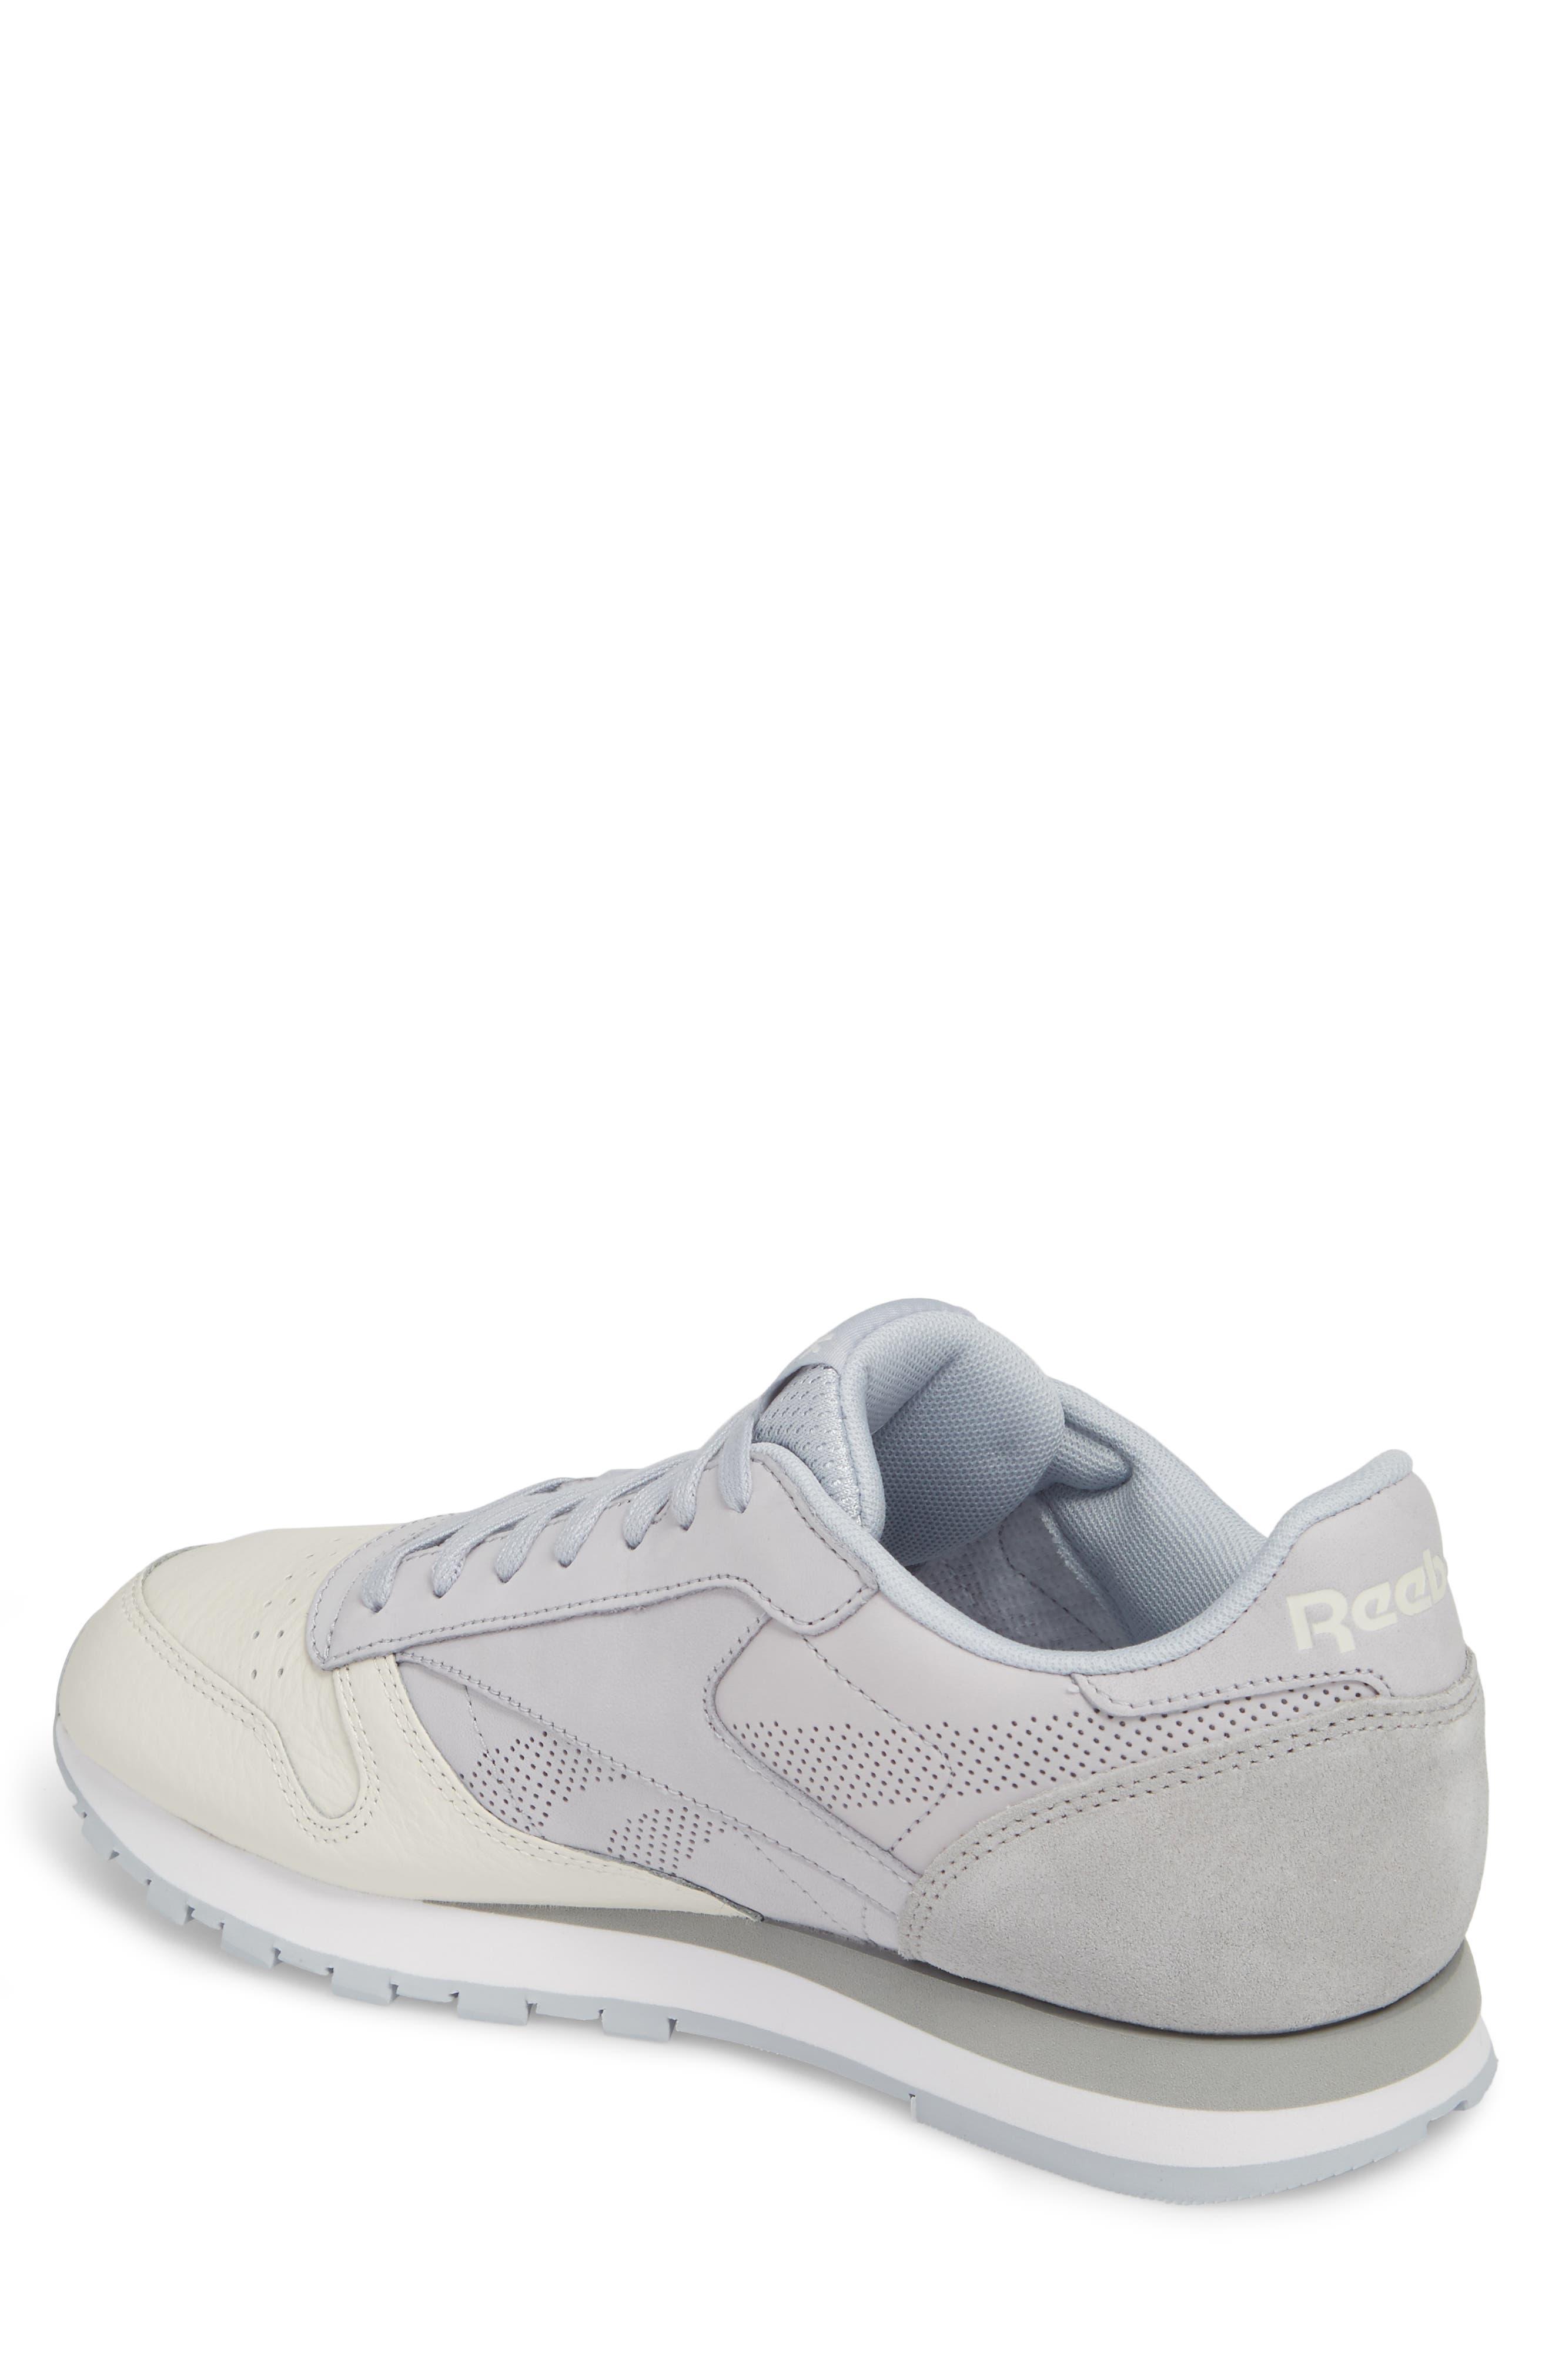 Classic Leather UE Sneaker,                             Alternate thumbnail 2, color,                             Grey/ Chalk/ Stark Grey/ White